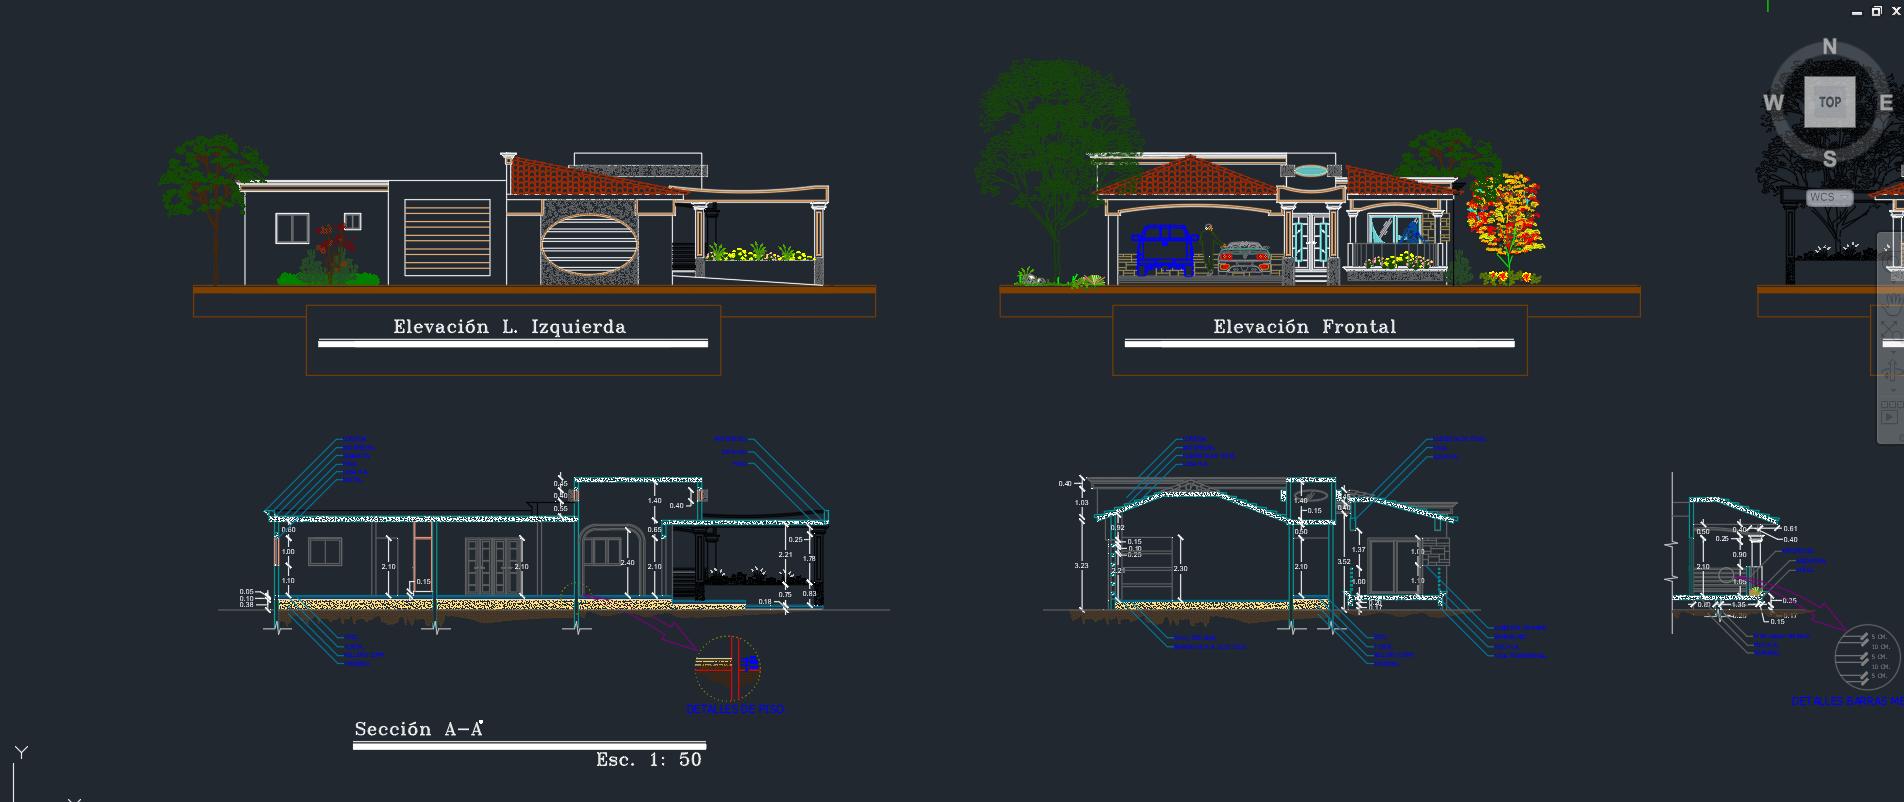 fotos de fachadas de casas sencillas en venezuela Casas De 200 M2 O Ms Descarga GRATIS De Planos